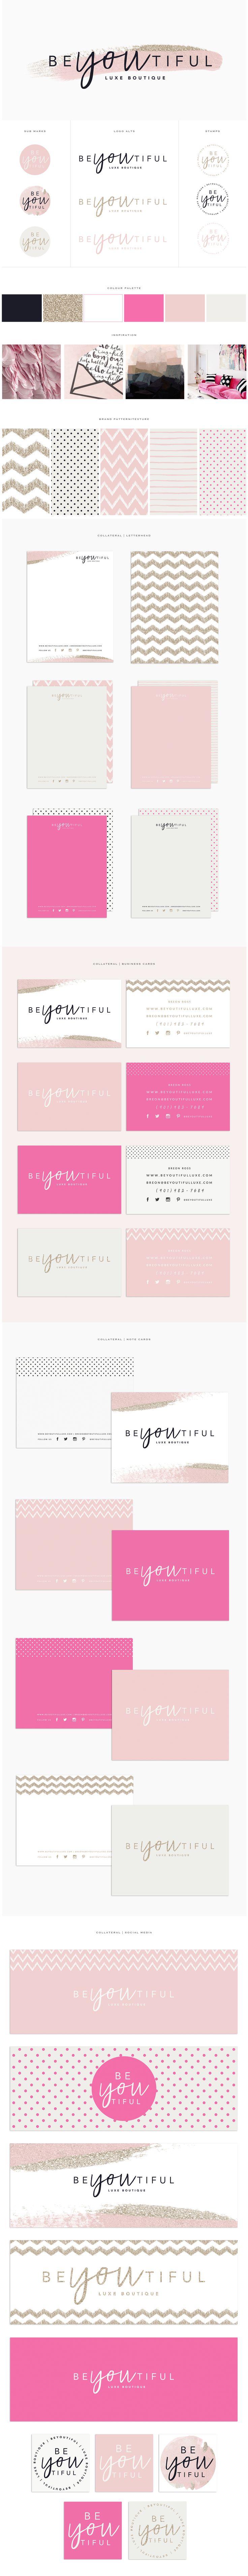 Brand Design for Beyoutiful Luxe Boutique | www.brandmebeautiful.co.uk